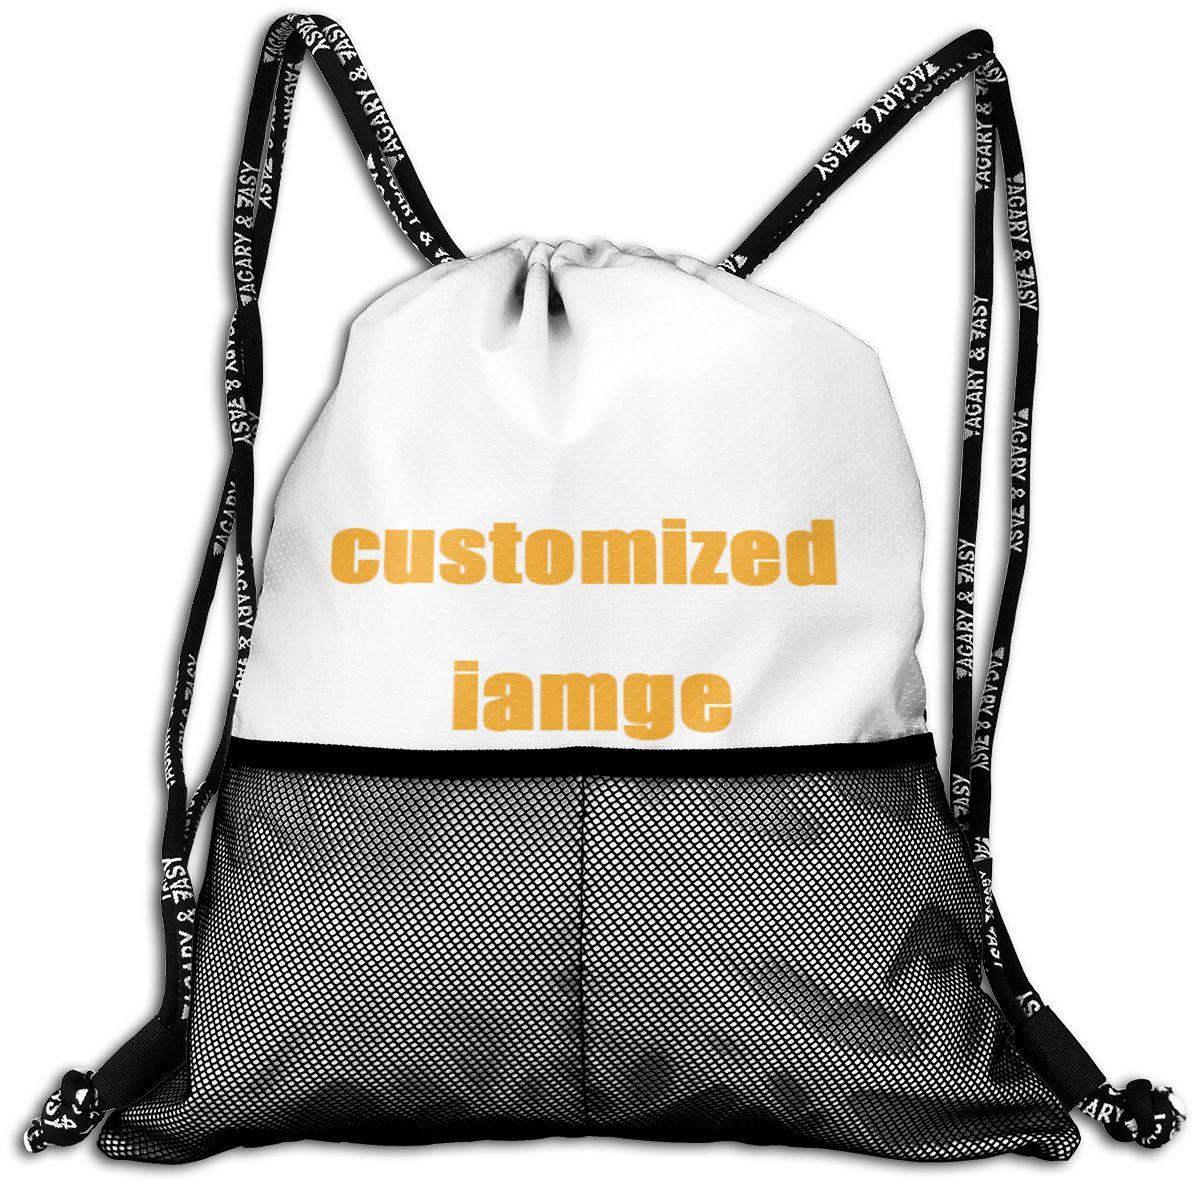 NOISYDESIGNS Custom Drawstring Bags For Women Men FashionBackpack Shopping Female Daily Casual Girl's Knapsack Customized